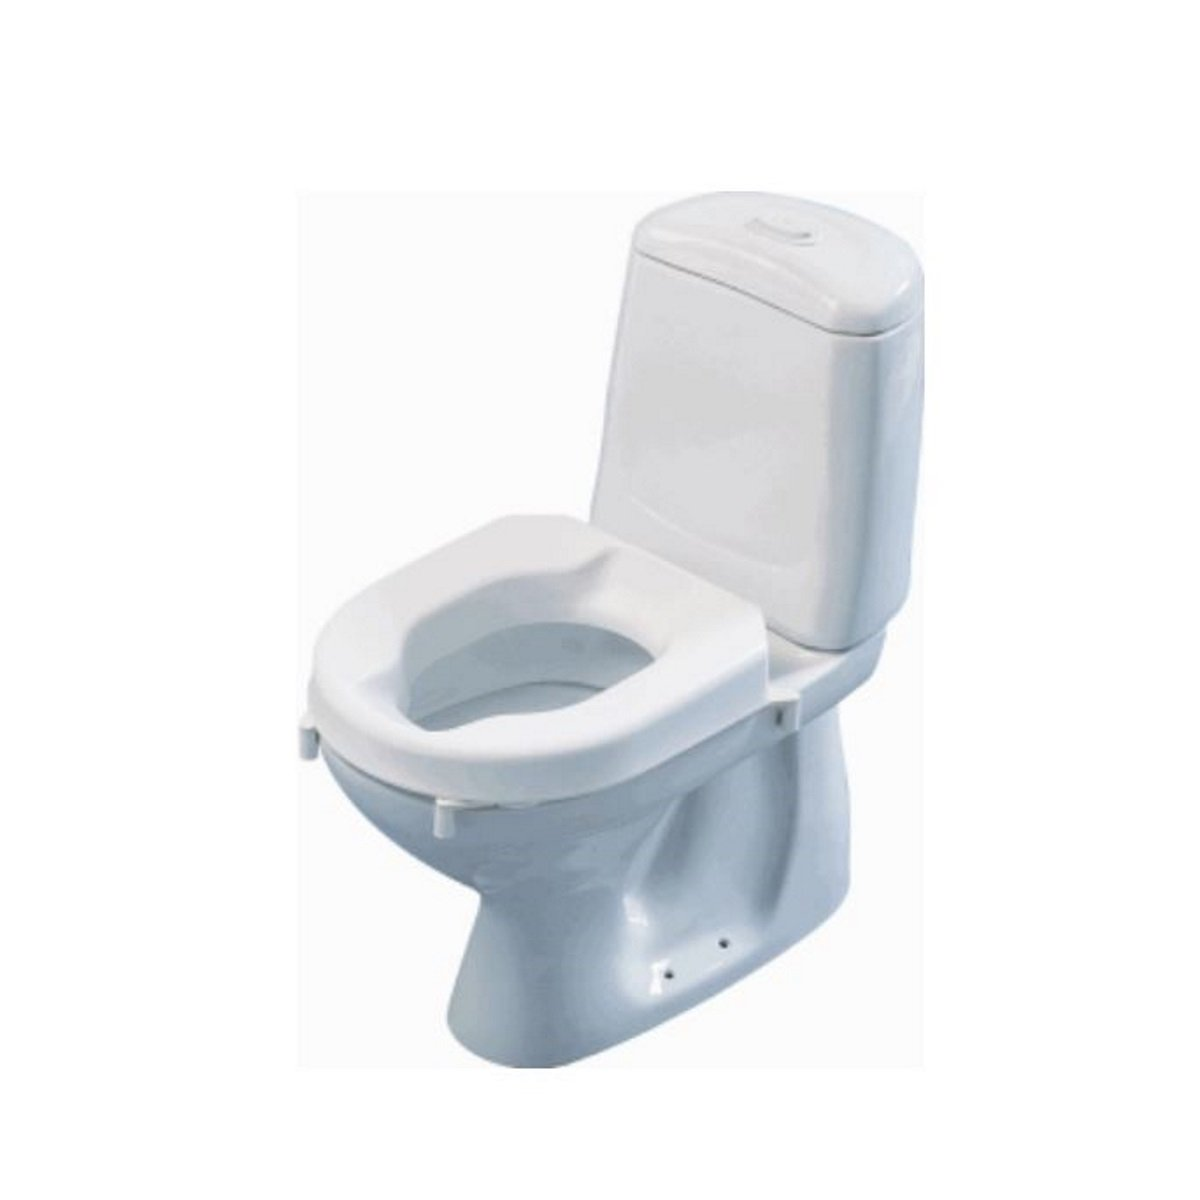 Able2 Hi loo toiletverhoger hoogte 6 cm Stuk